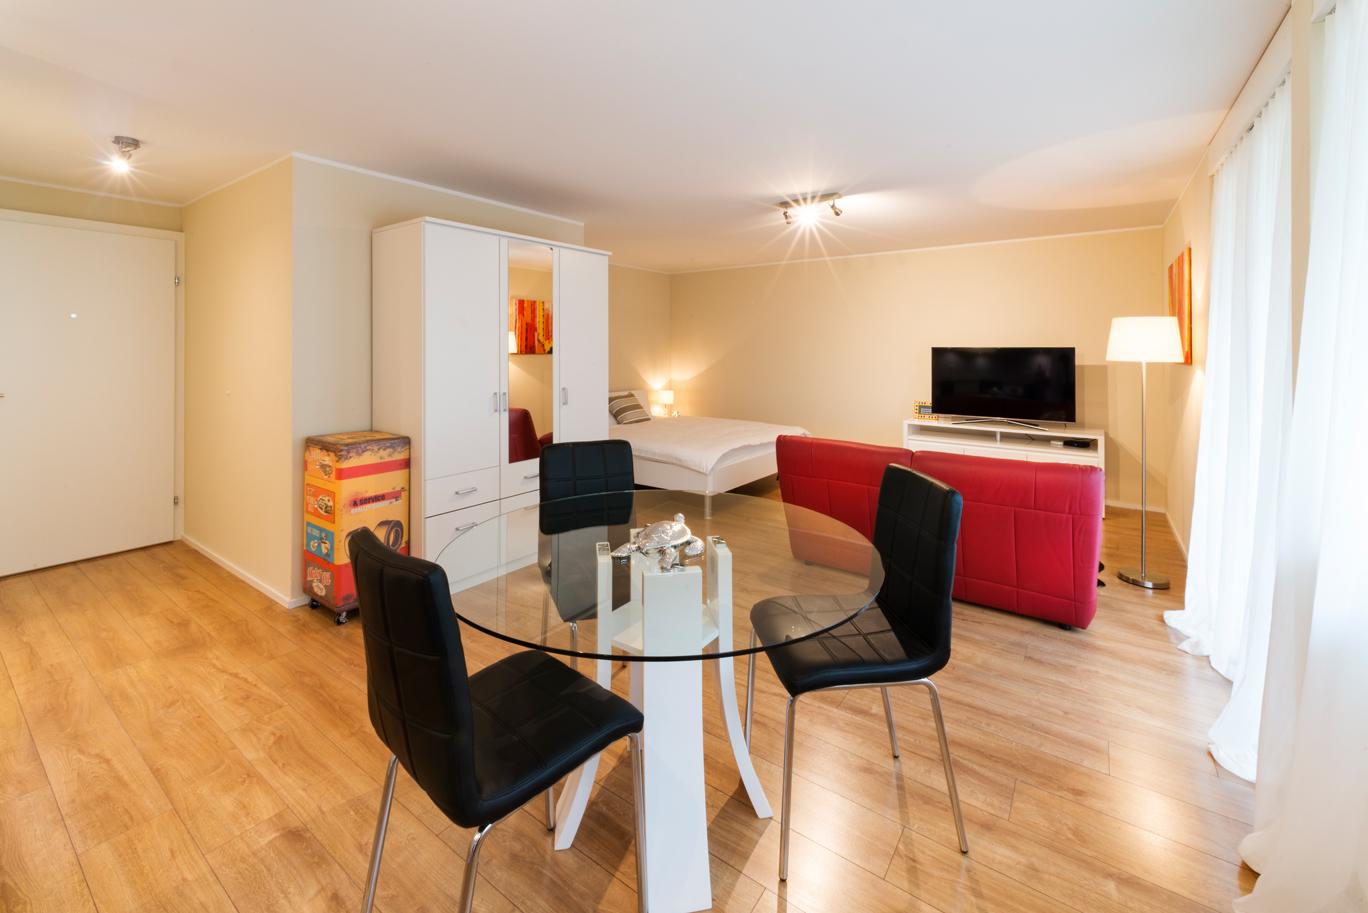 pluto 1 5 zimmer apartment in wallisellen reloc. Black Bedroom Furniture Sets. Home Design Ideas